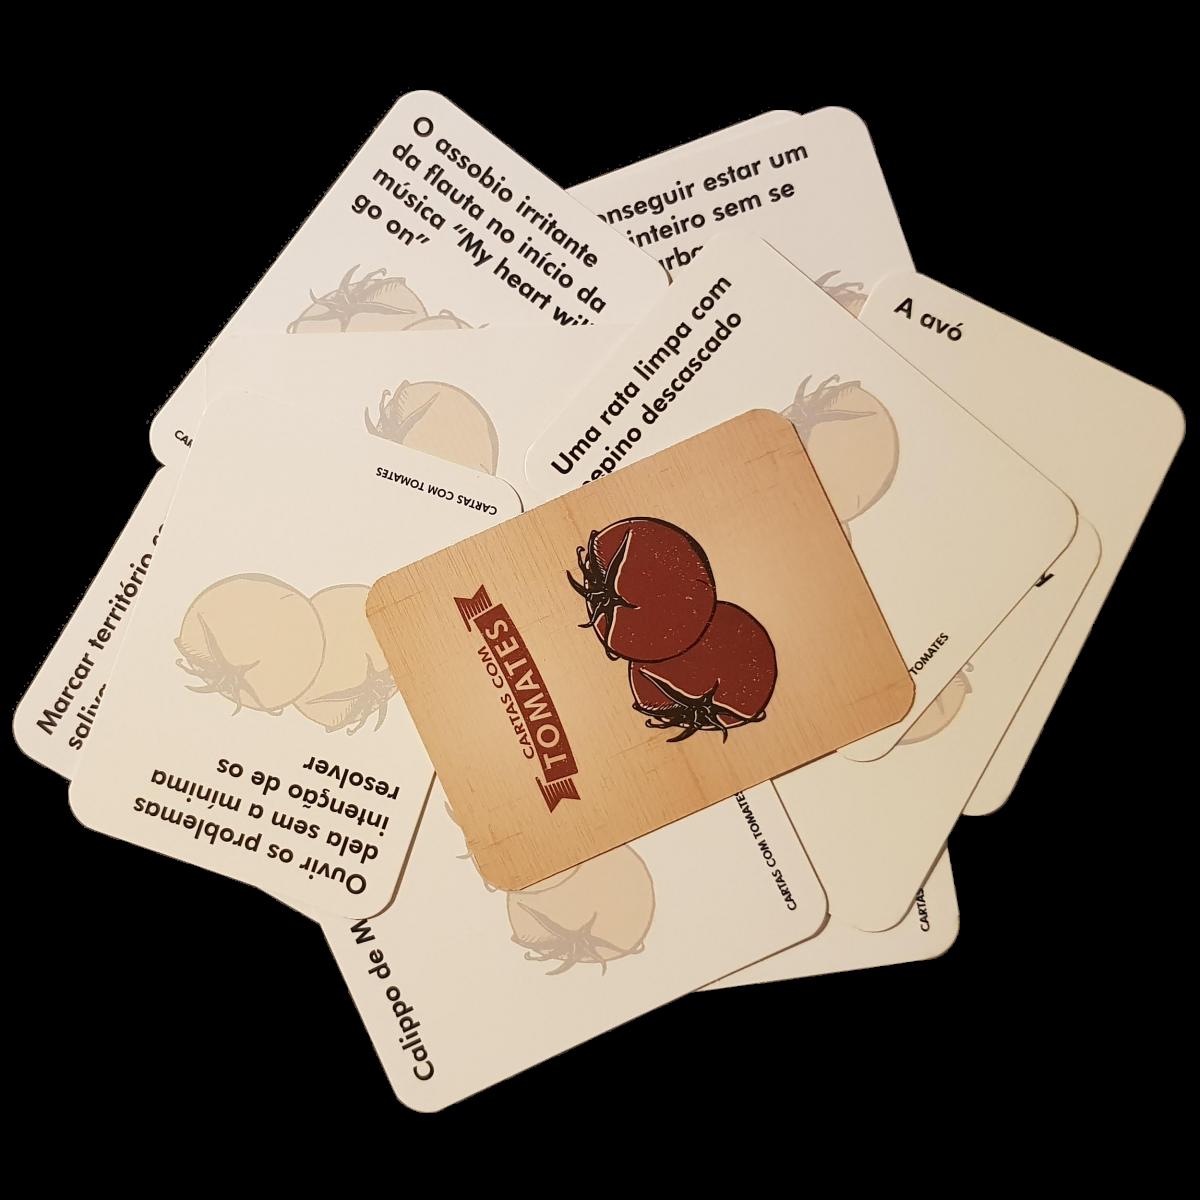 monte de cartas